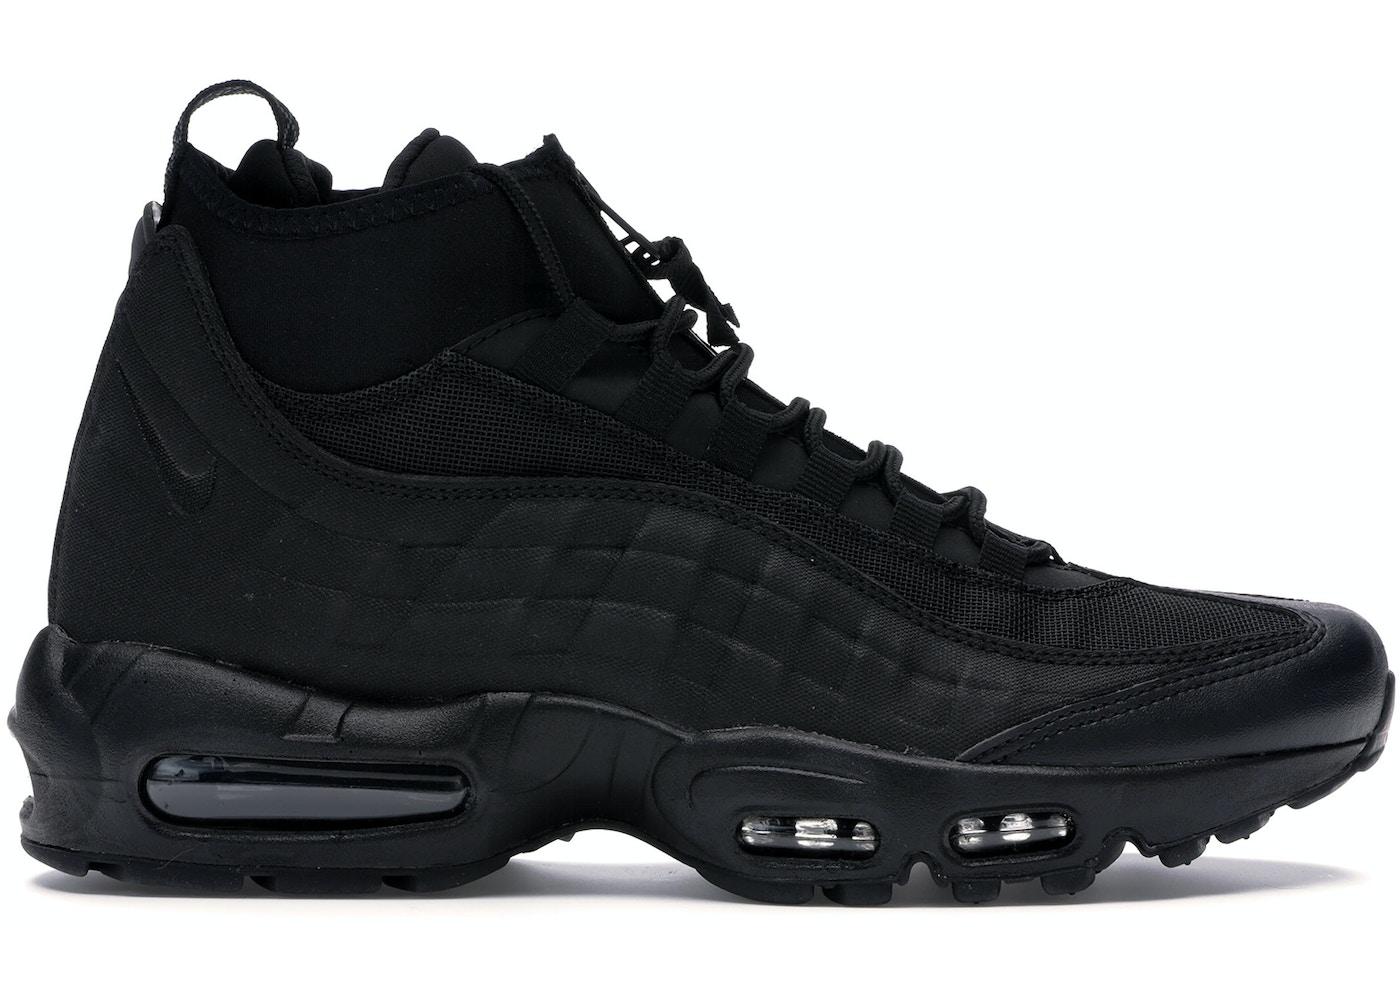 size 40 fbf3b ade19 Air Max 95 Sneakerboot Triple Black